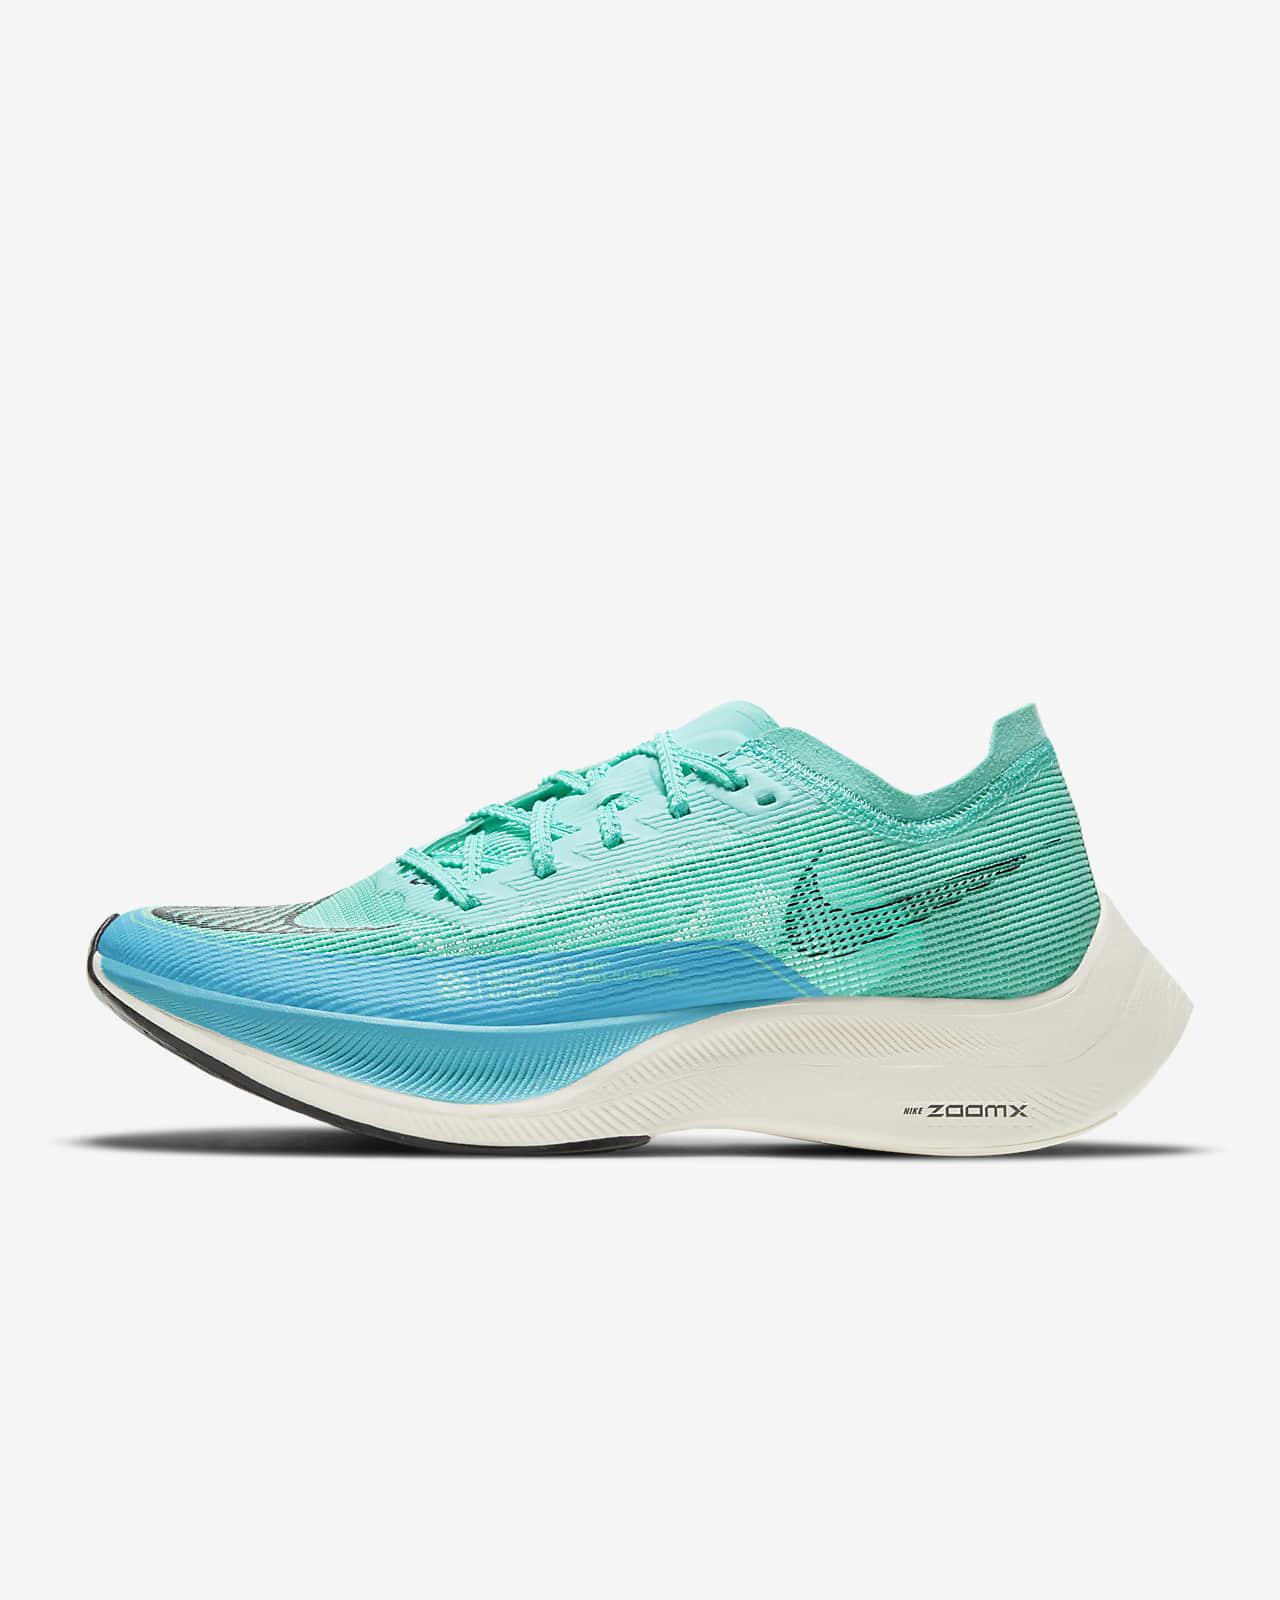 Calzado de carrera para mujer Nike ZoomX Vaporfly Next% 2